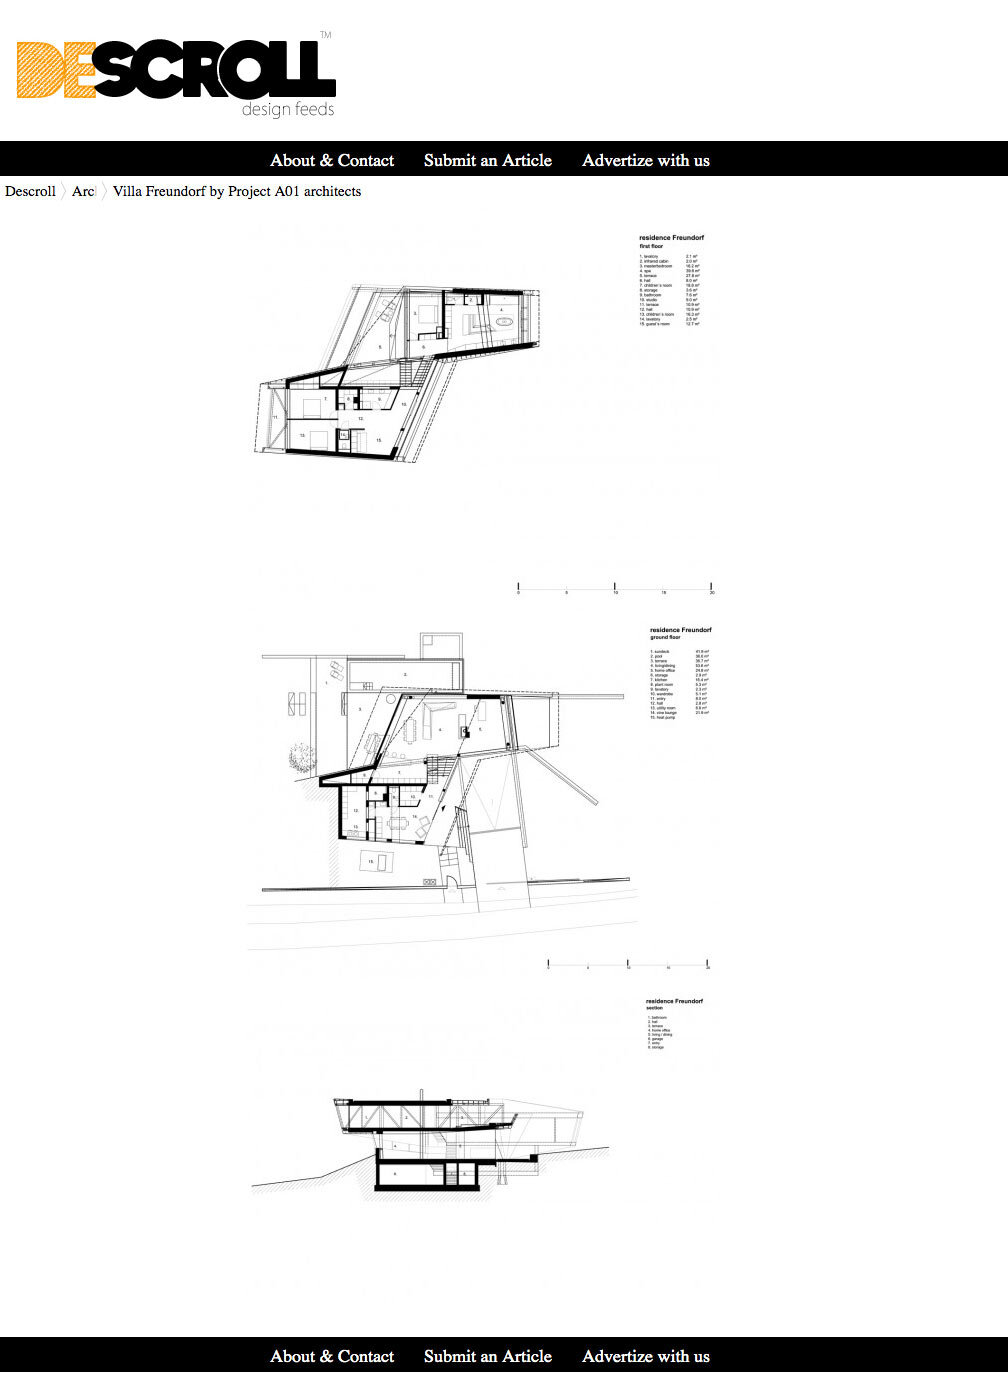 screencapture-descroll-11.jpg